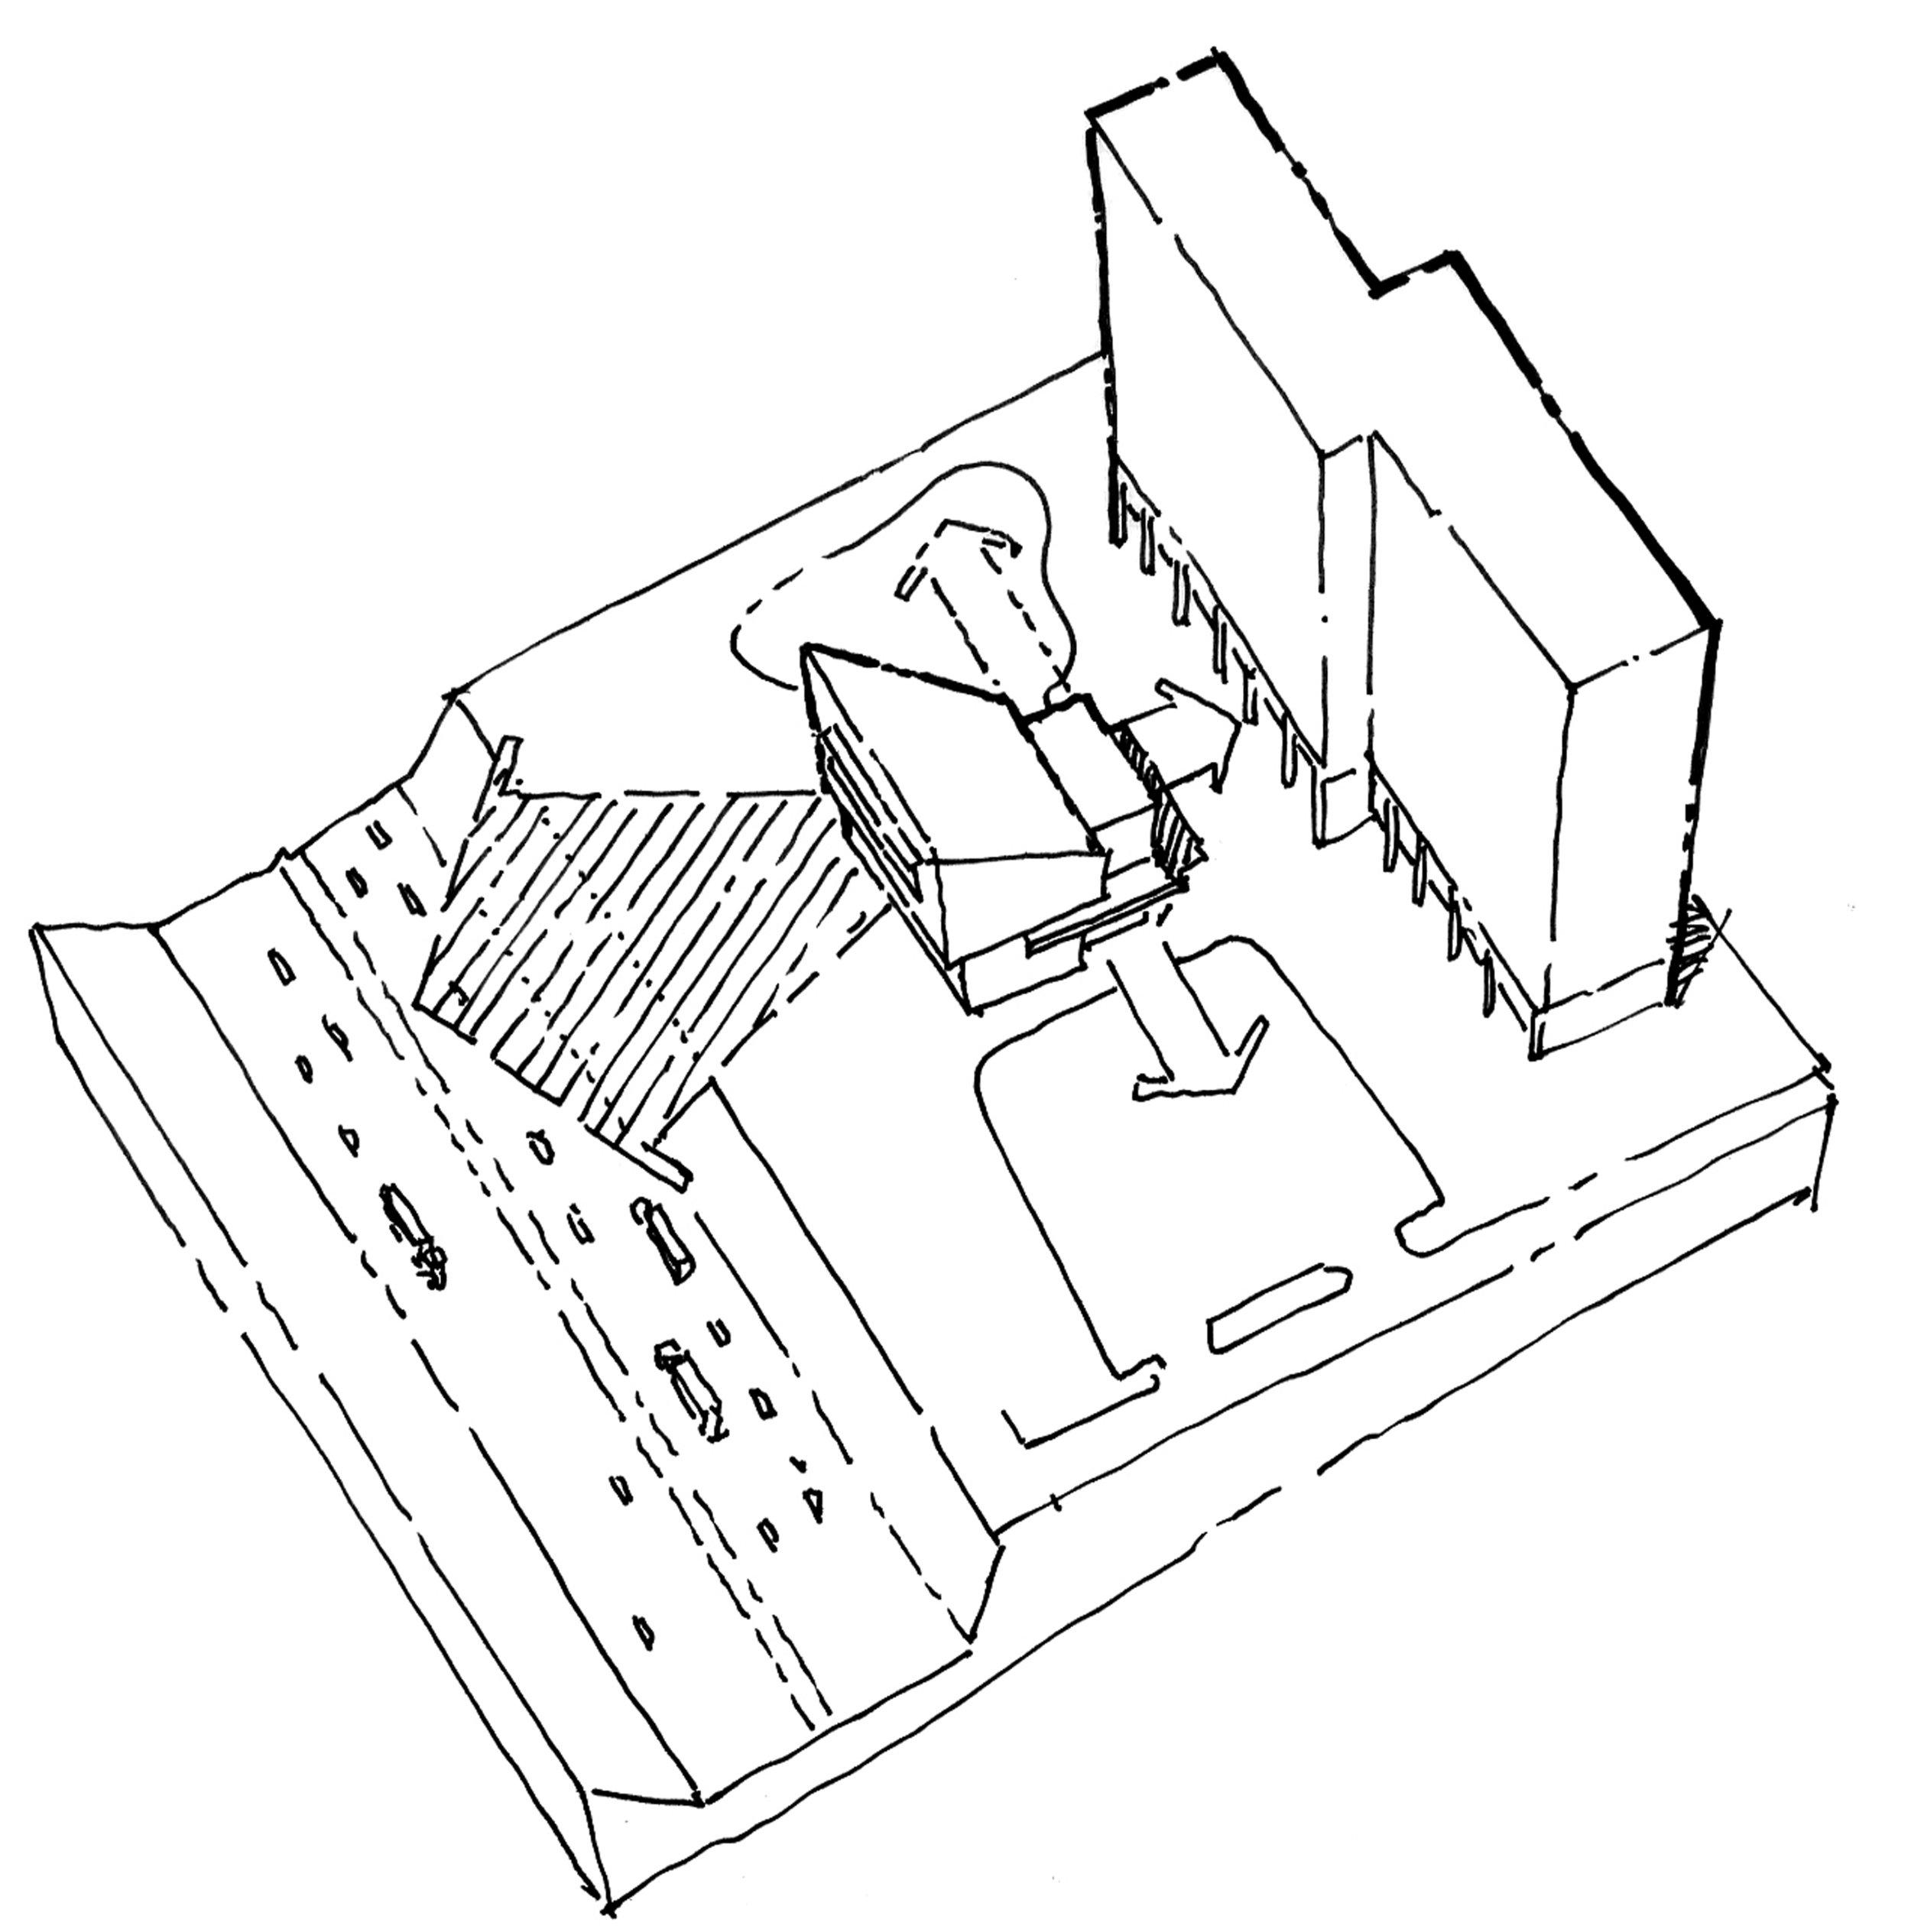 9901_diagram 1_community building_102907.jpg